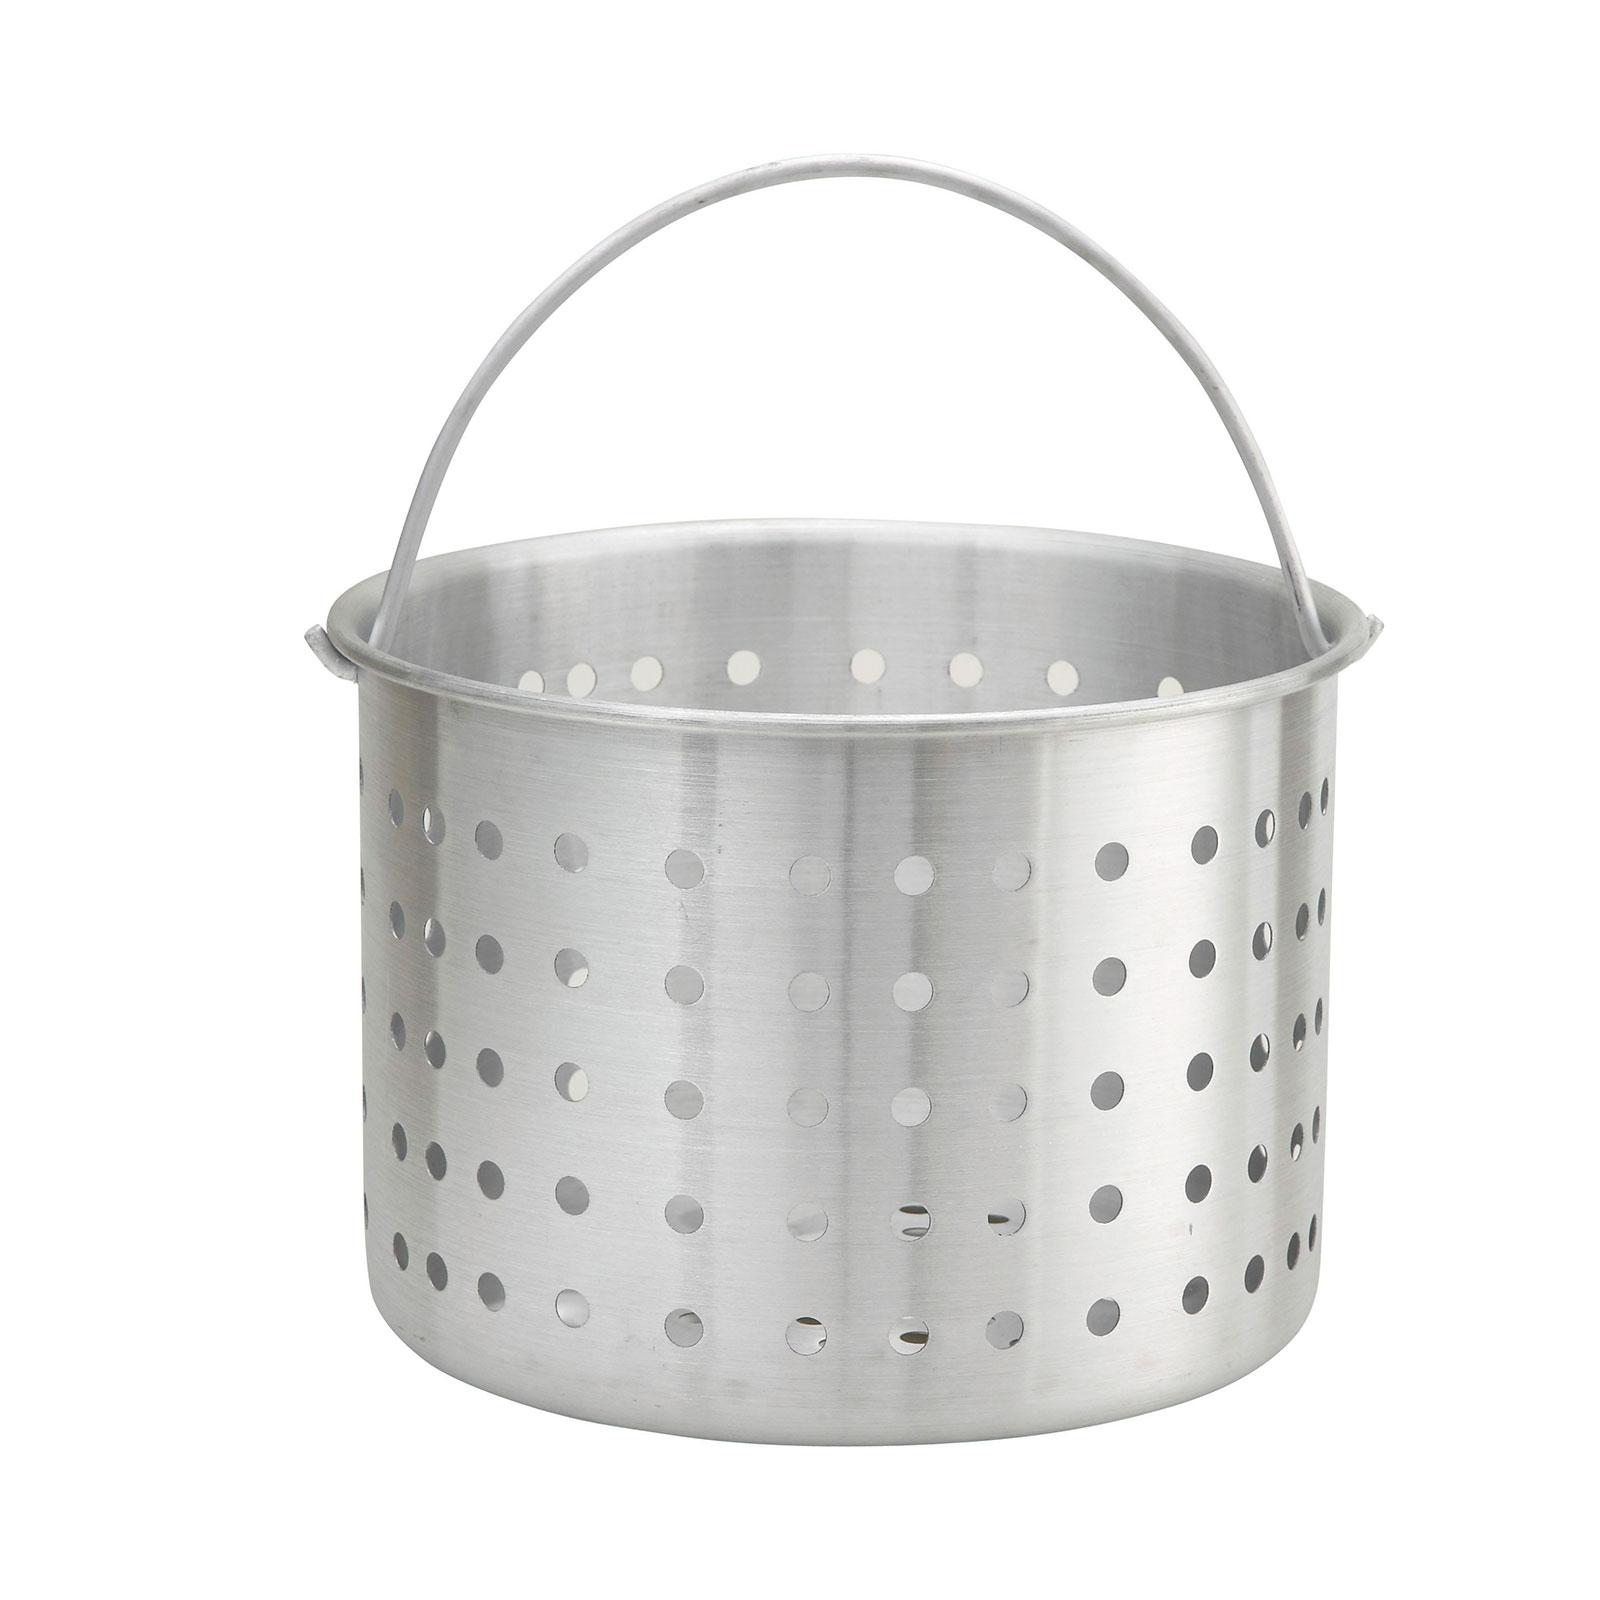 1000-34 Winco ALSB-80 stock / steam pot, steamer basket